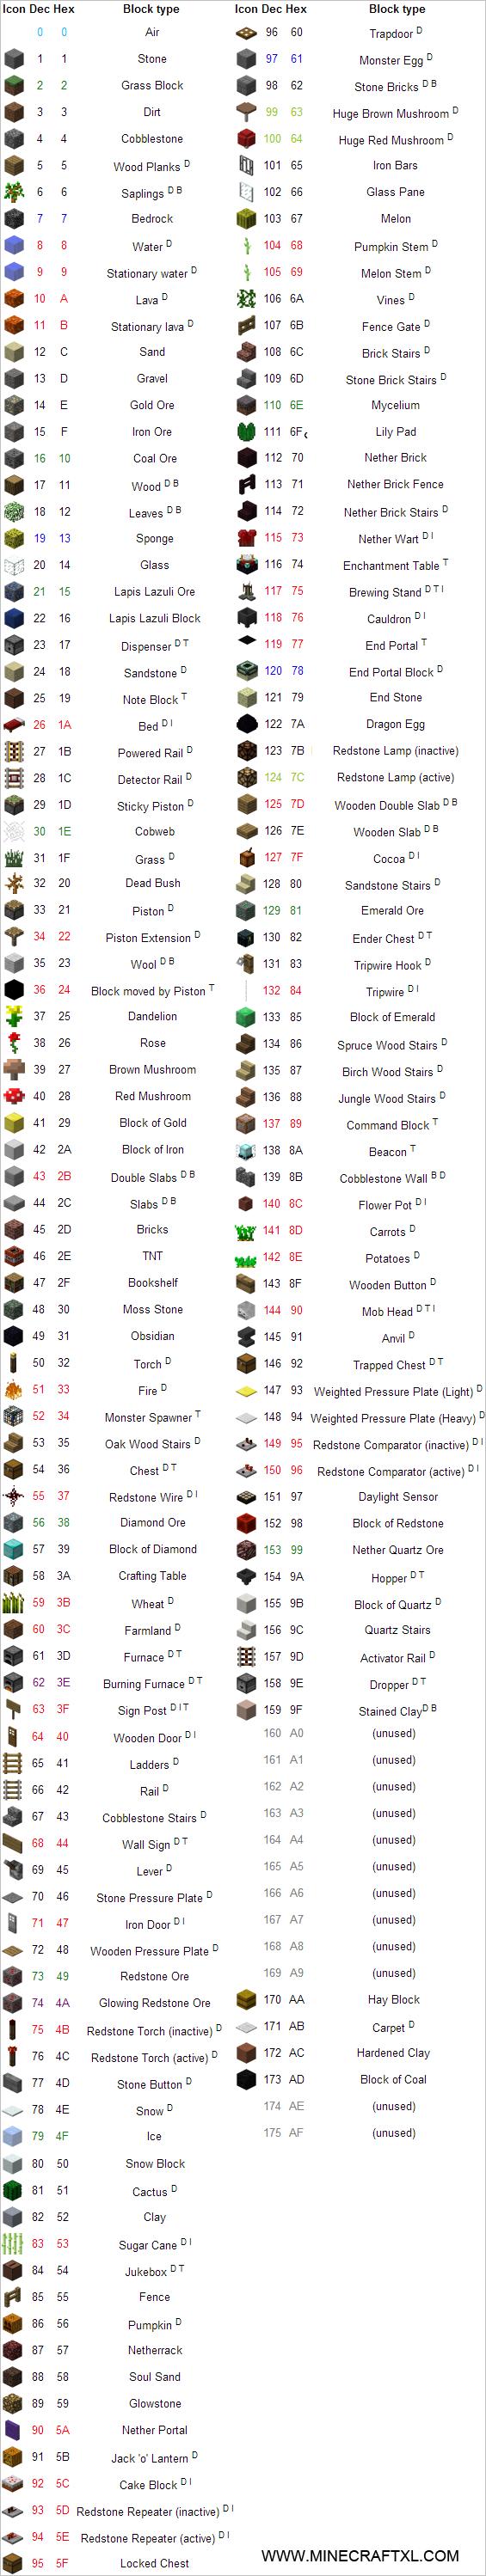 Minecraft Data Values List Of Block Item Entity Biome Id S Minecraft 1.13 | how to: minecraft data values list of block